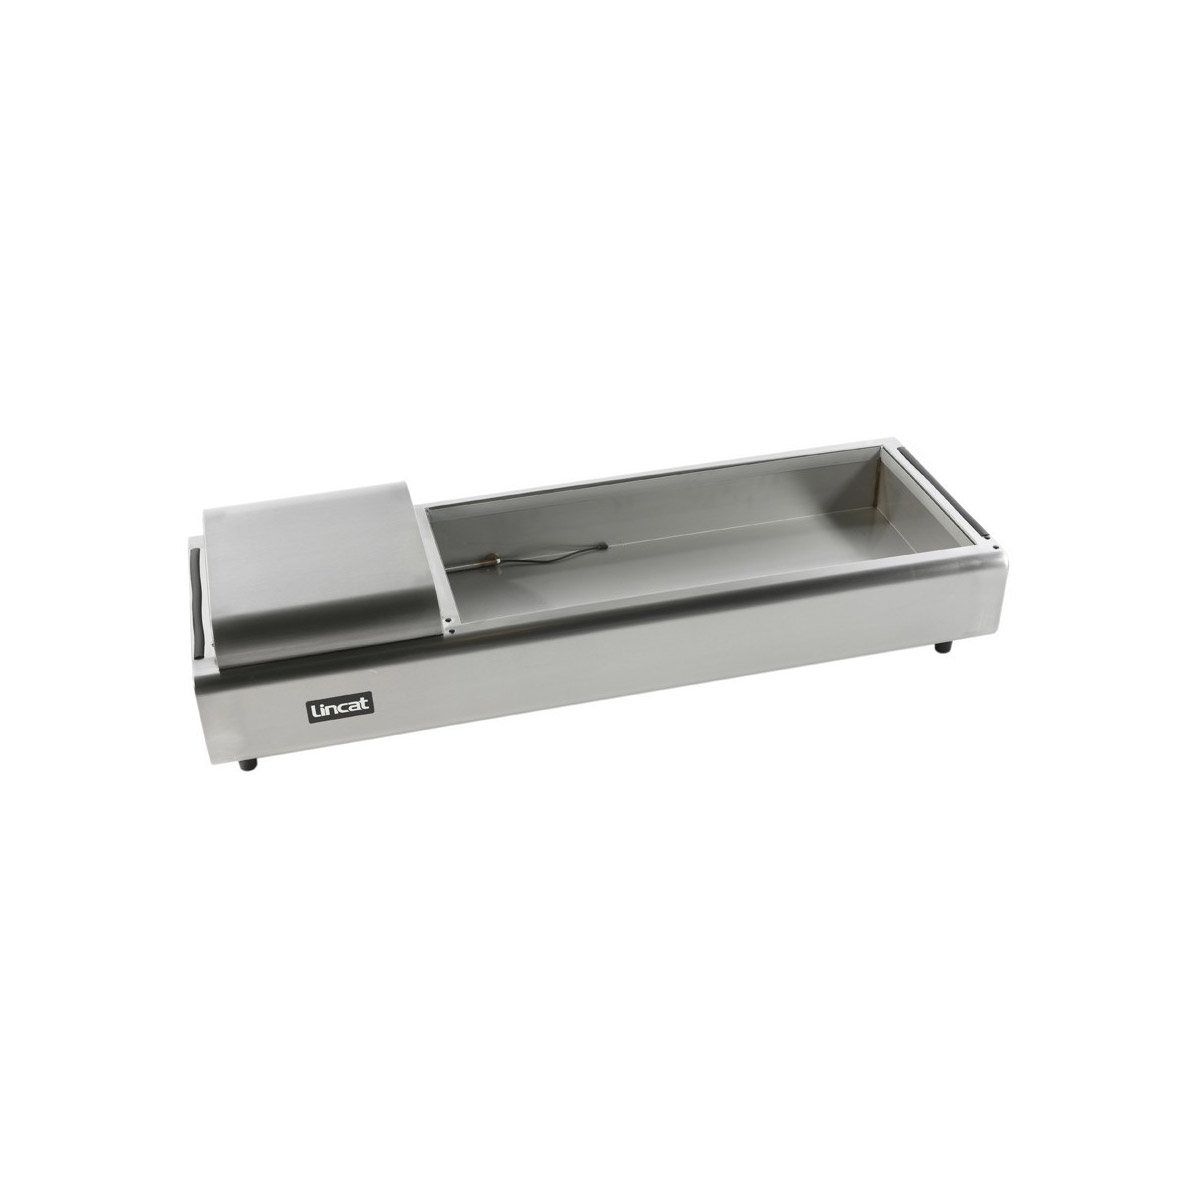 FDB4 - Lincat Seal Counter-top Food Display Bar - Refrigerated - W 1045 mm - 0.175 kW